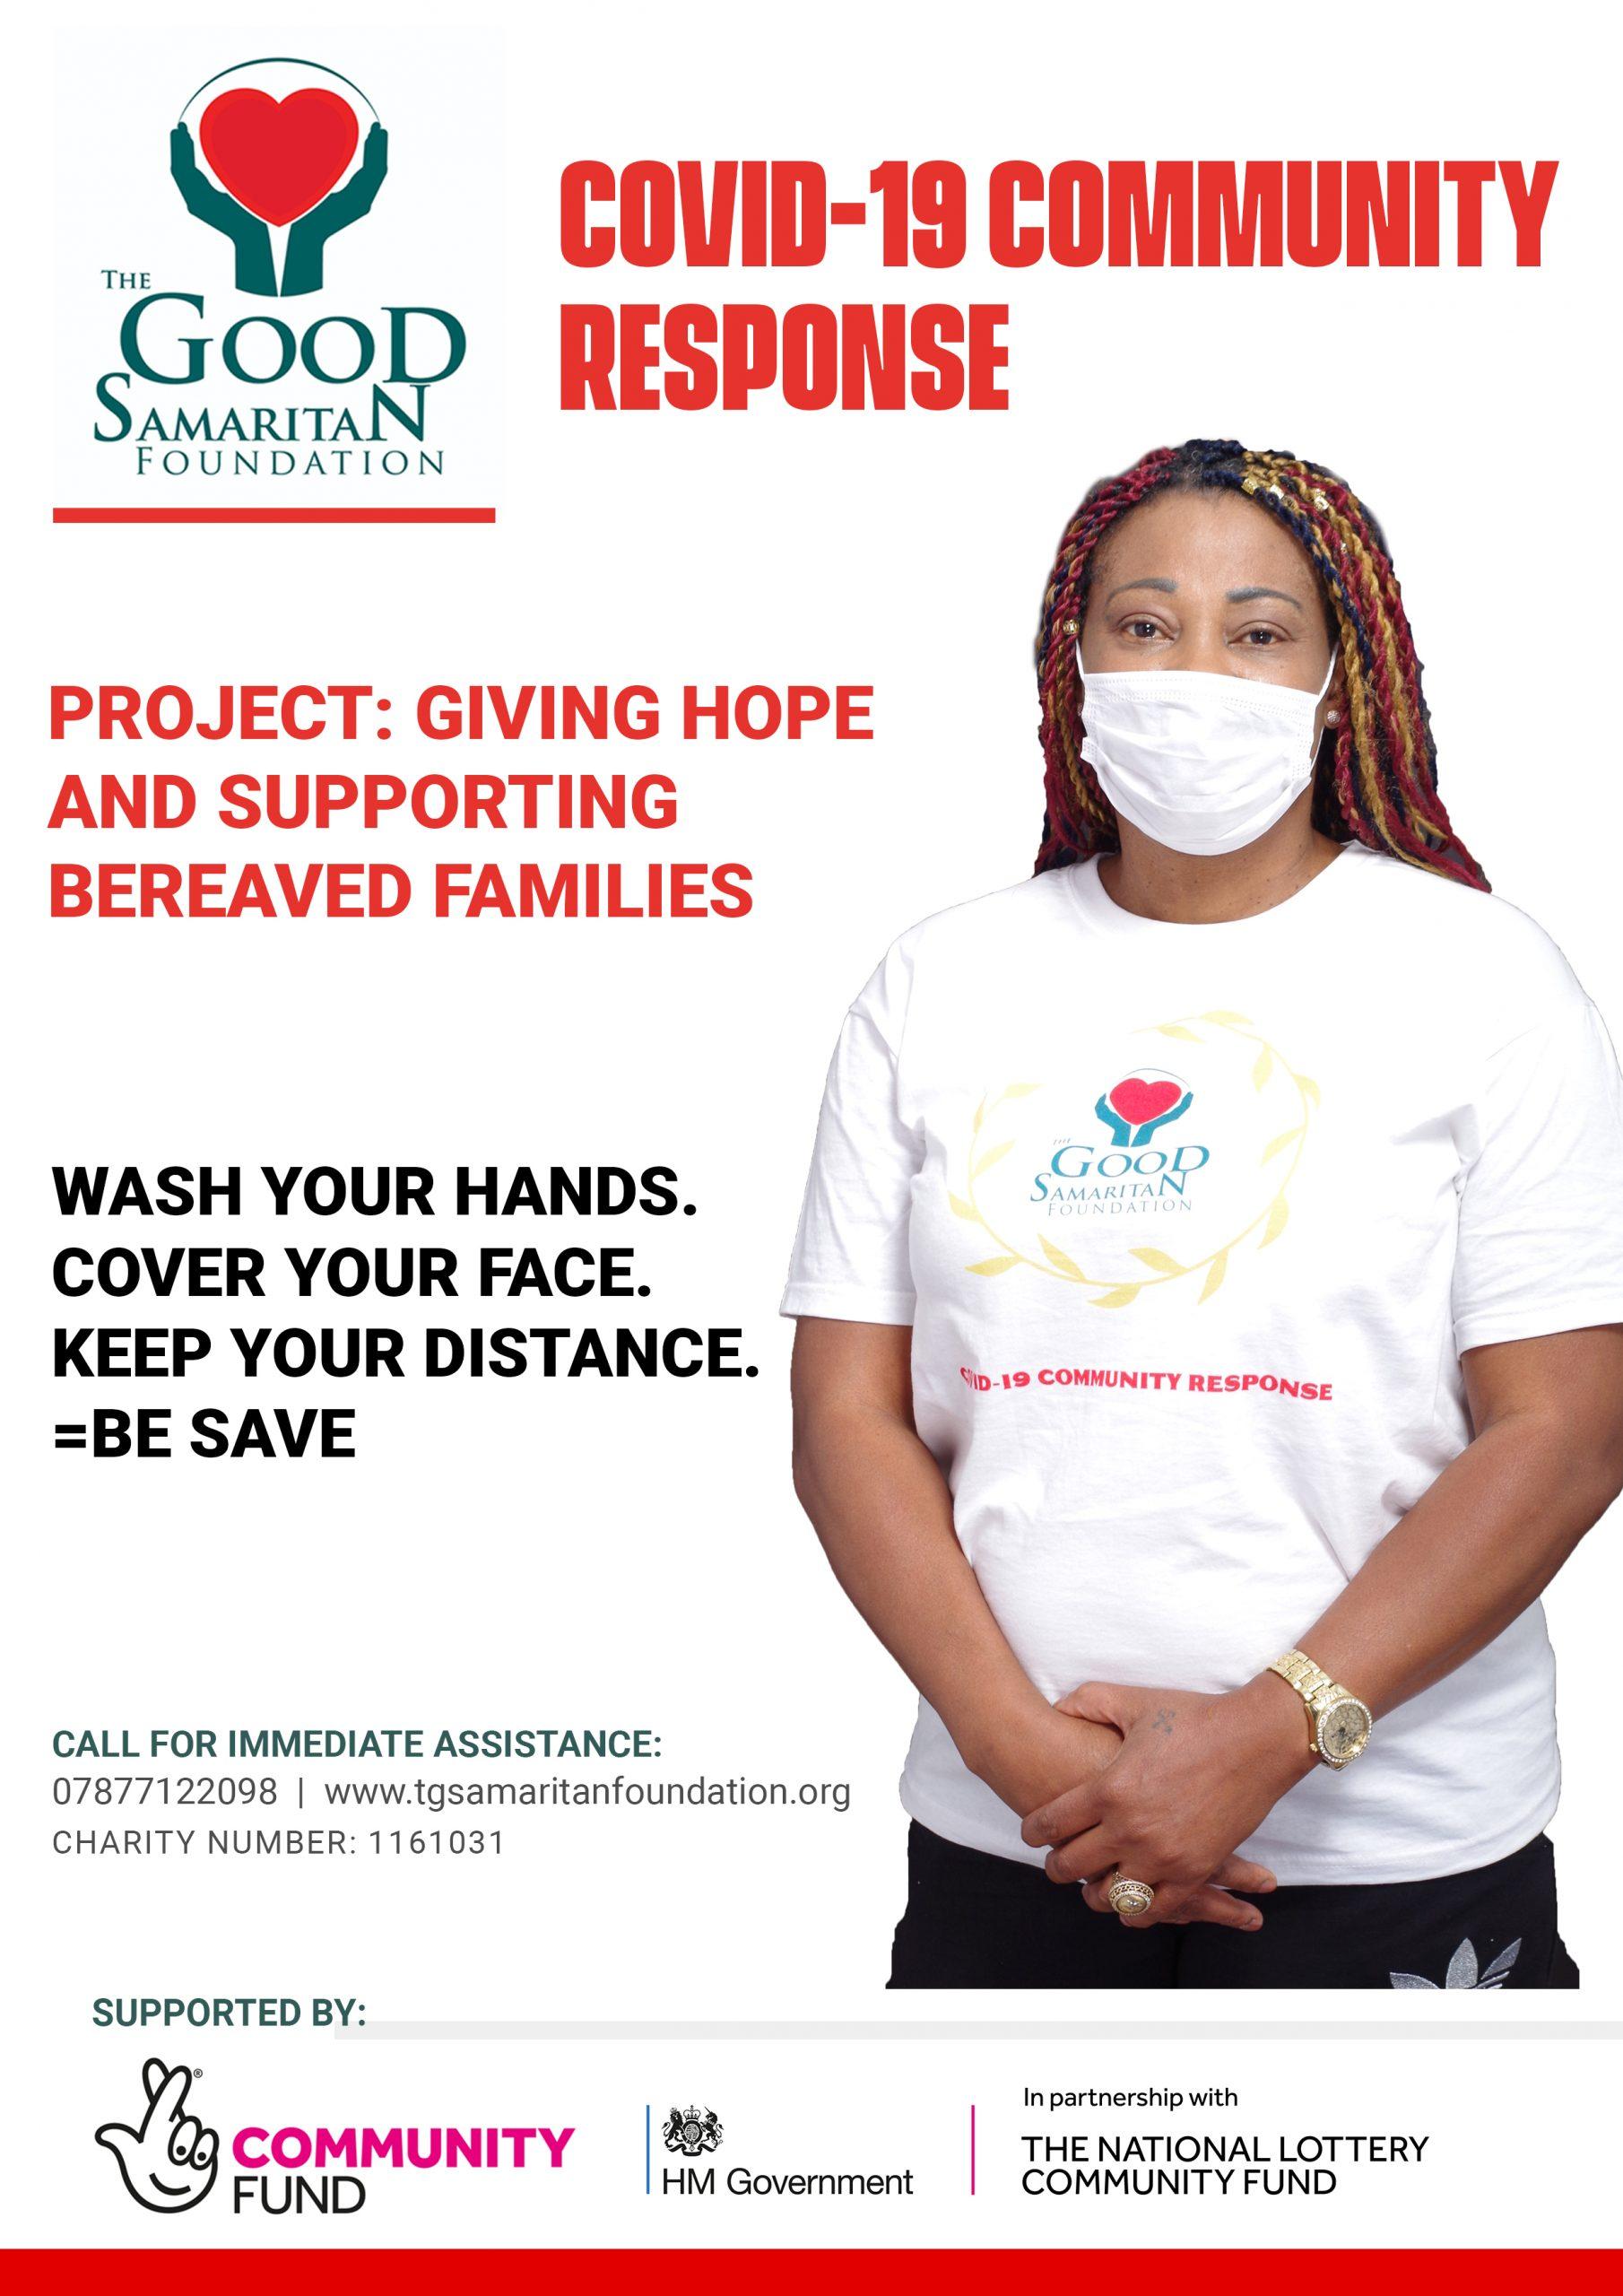 Covid-19 Community Response